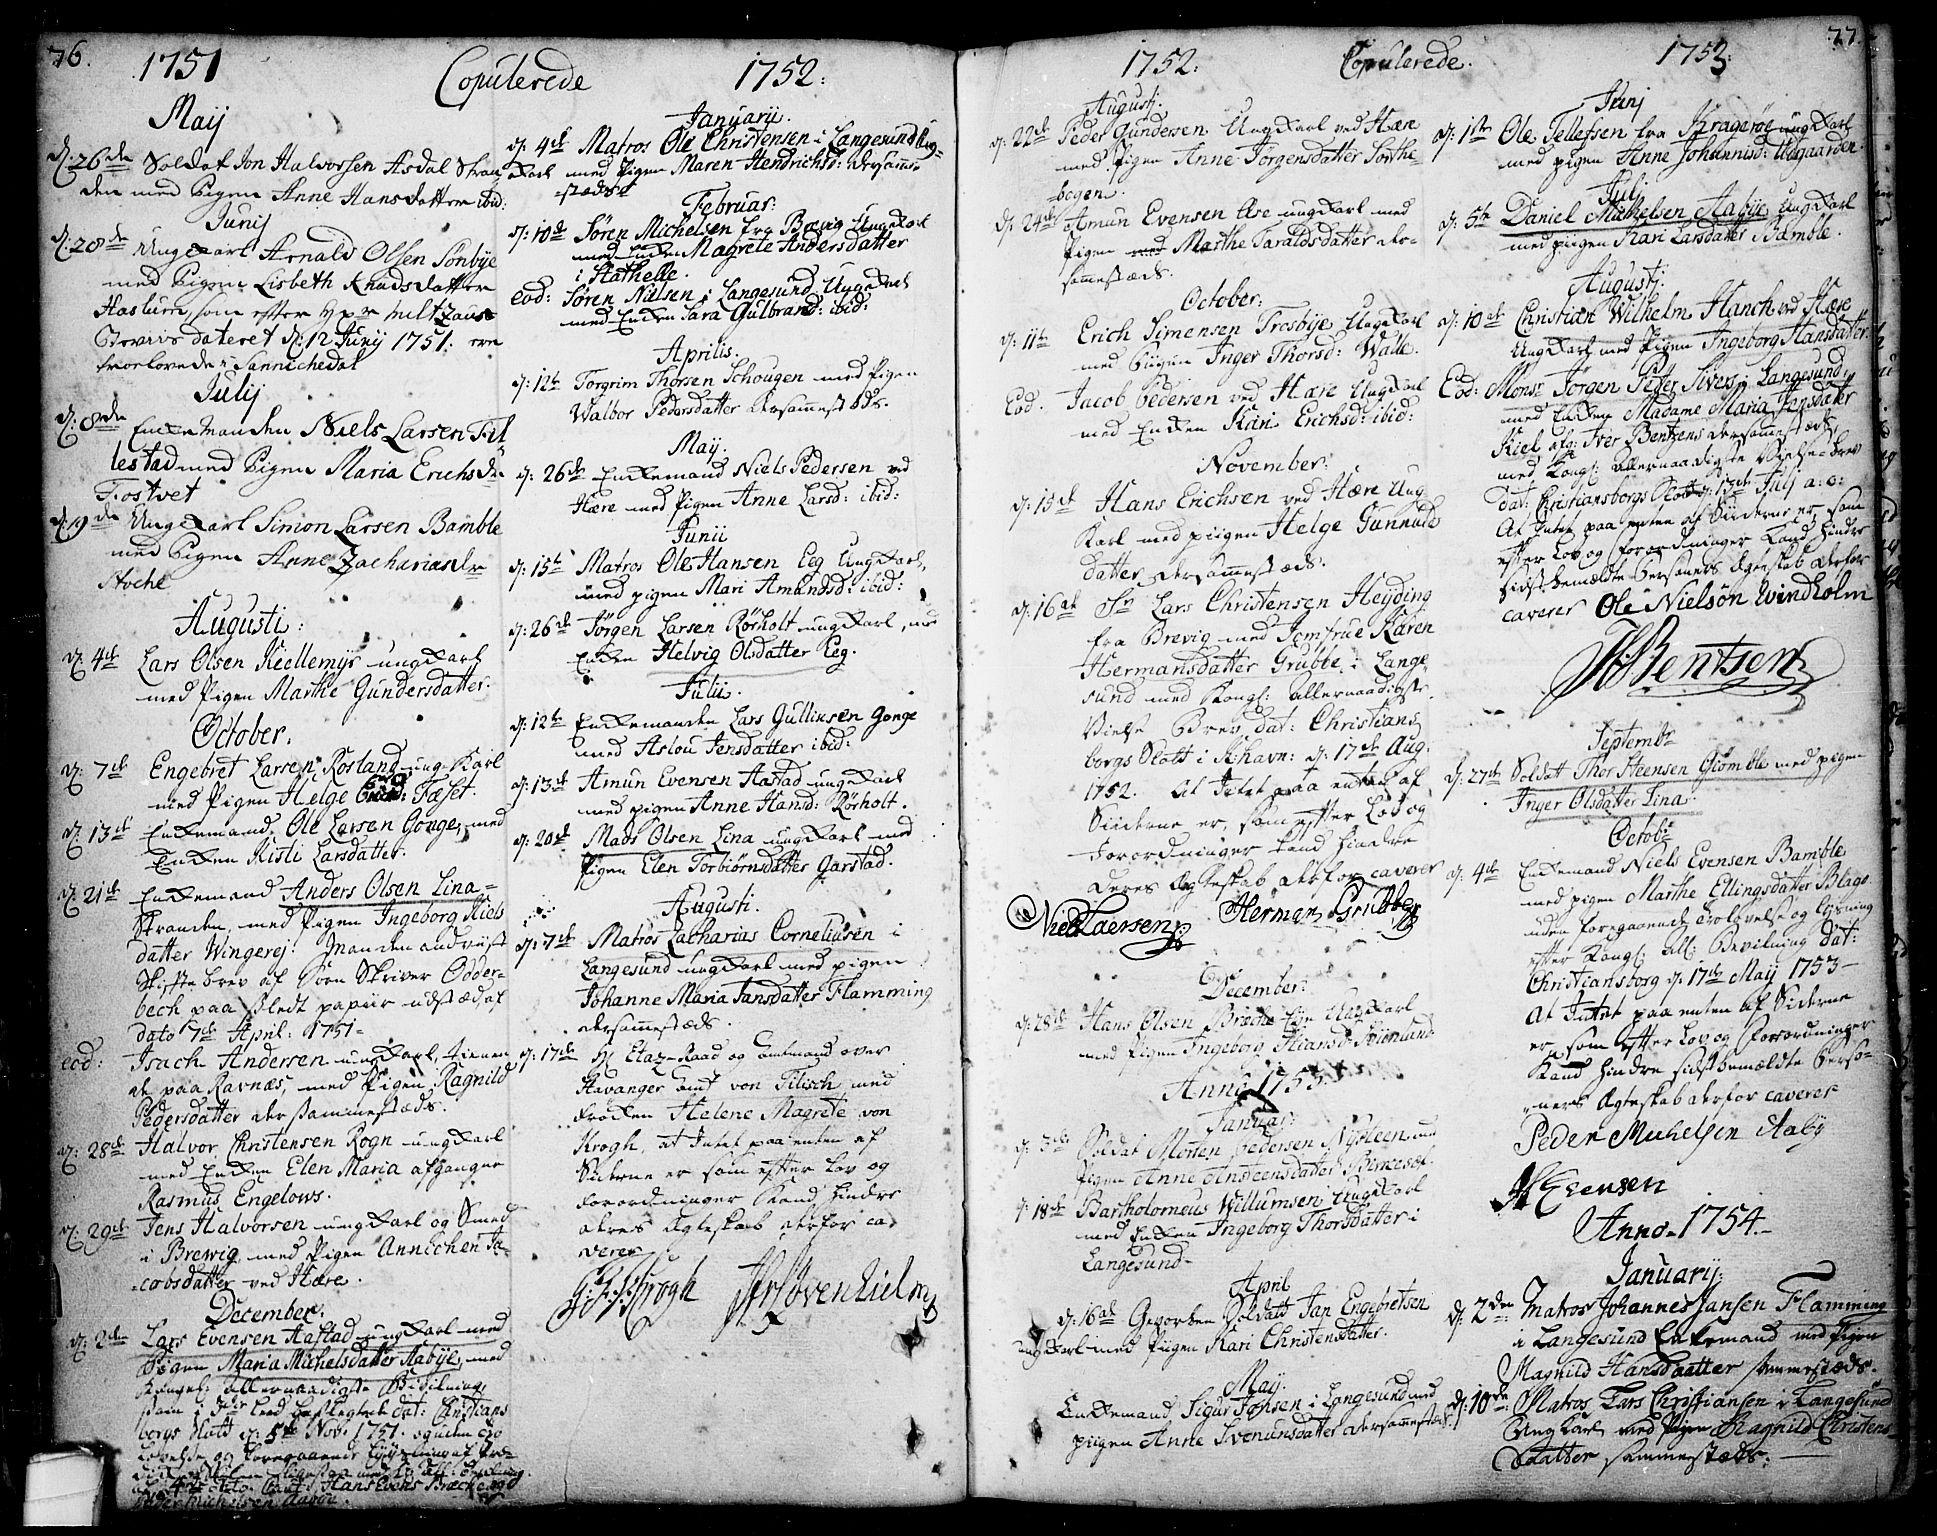 SAKO, Bamble kirkebøker, F/Fa/L0001: Ministerialbok nr. I 1, 1702-1774, s. 76-77